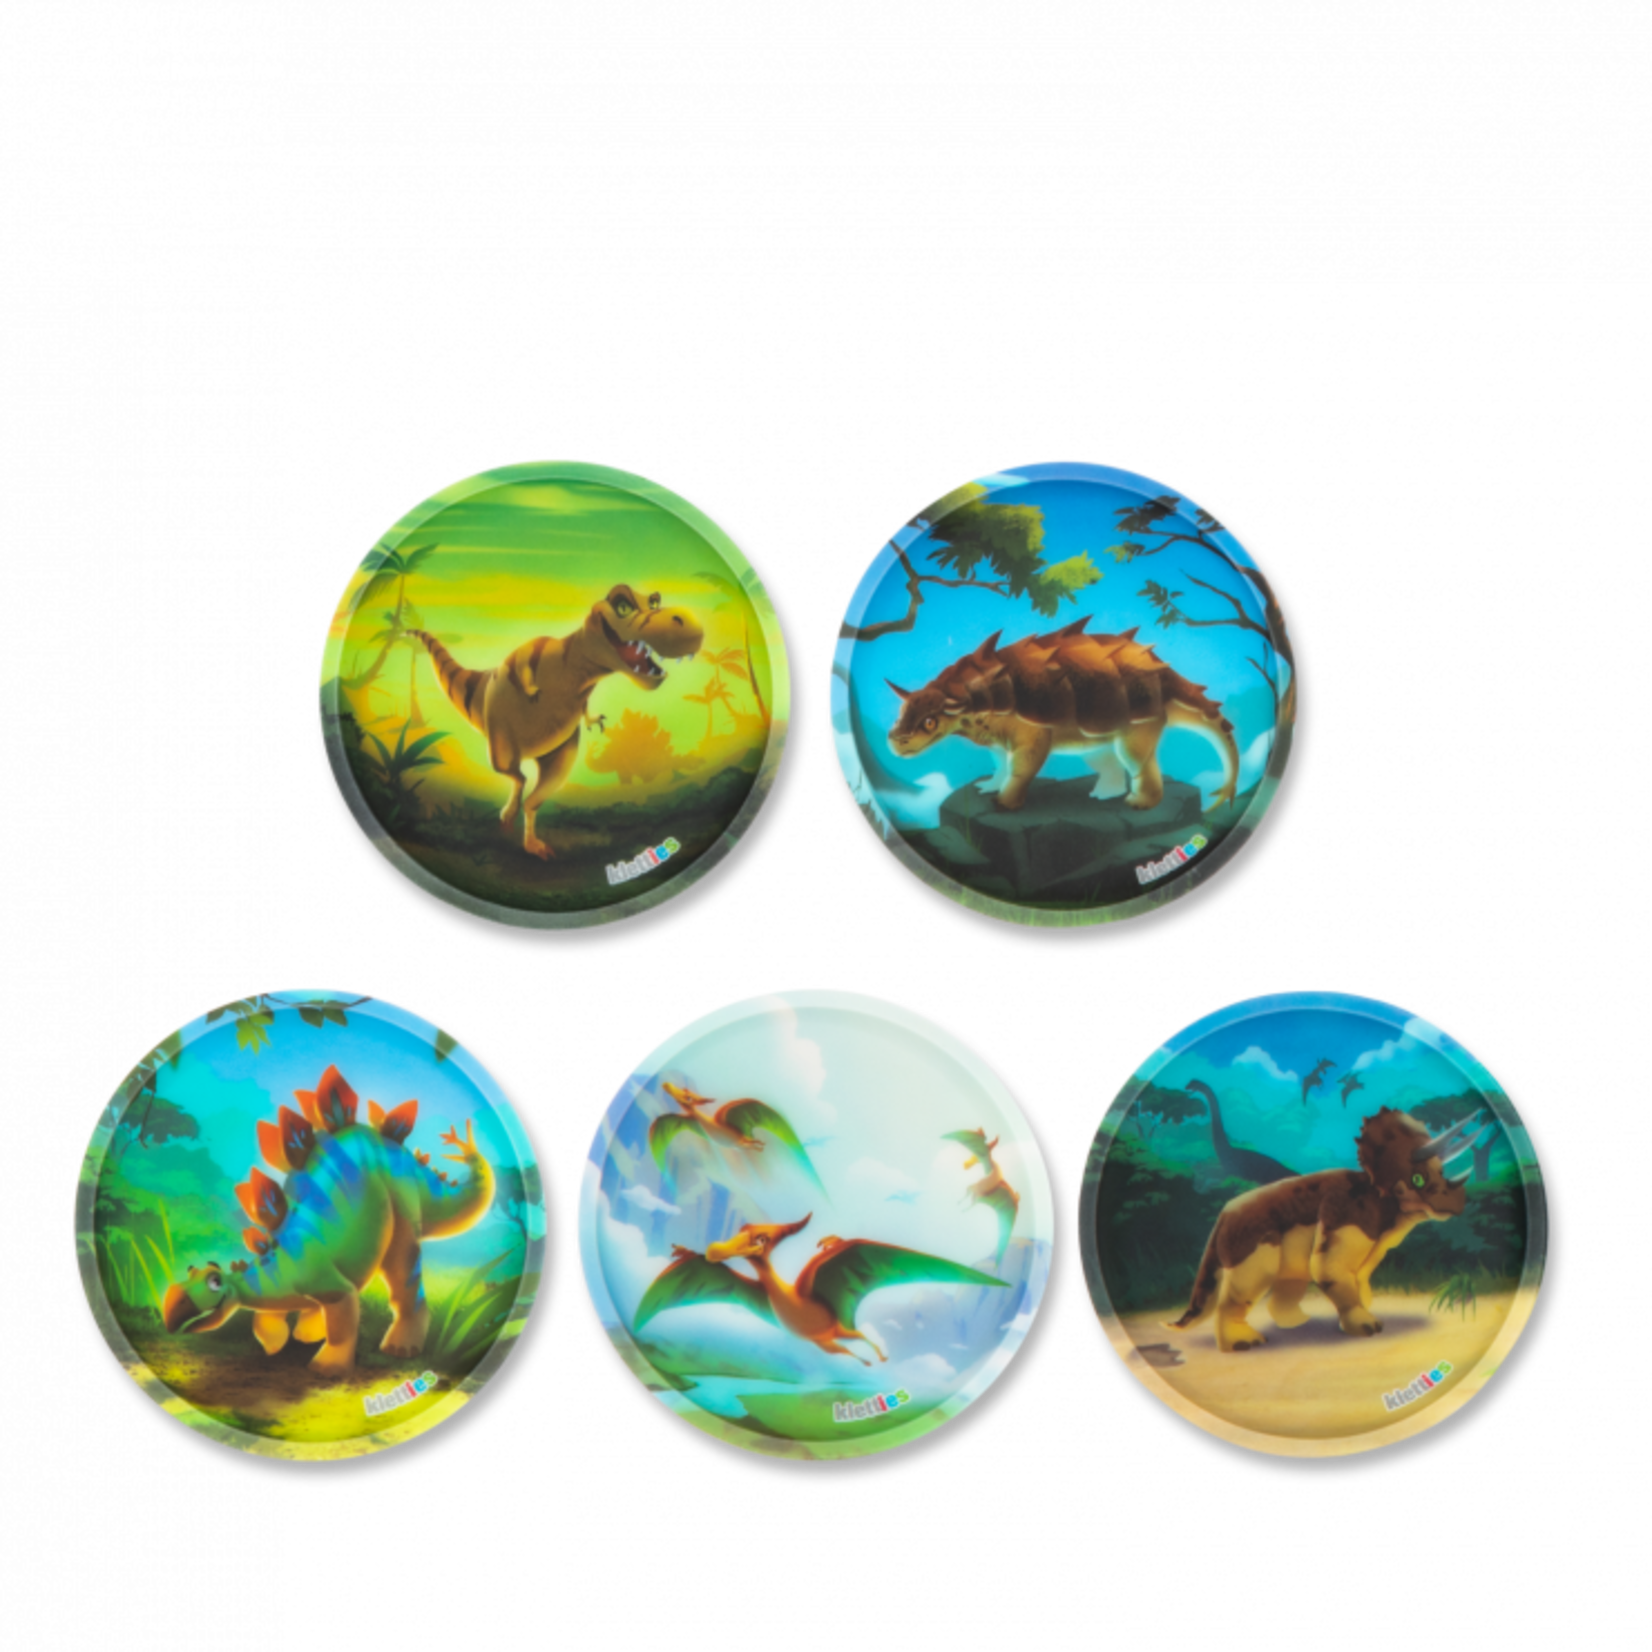 ERGOBAG ERGOBAG KLETTIE SET 5tlg Dinosaurier 20